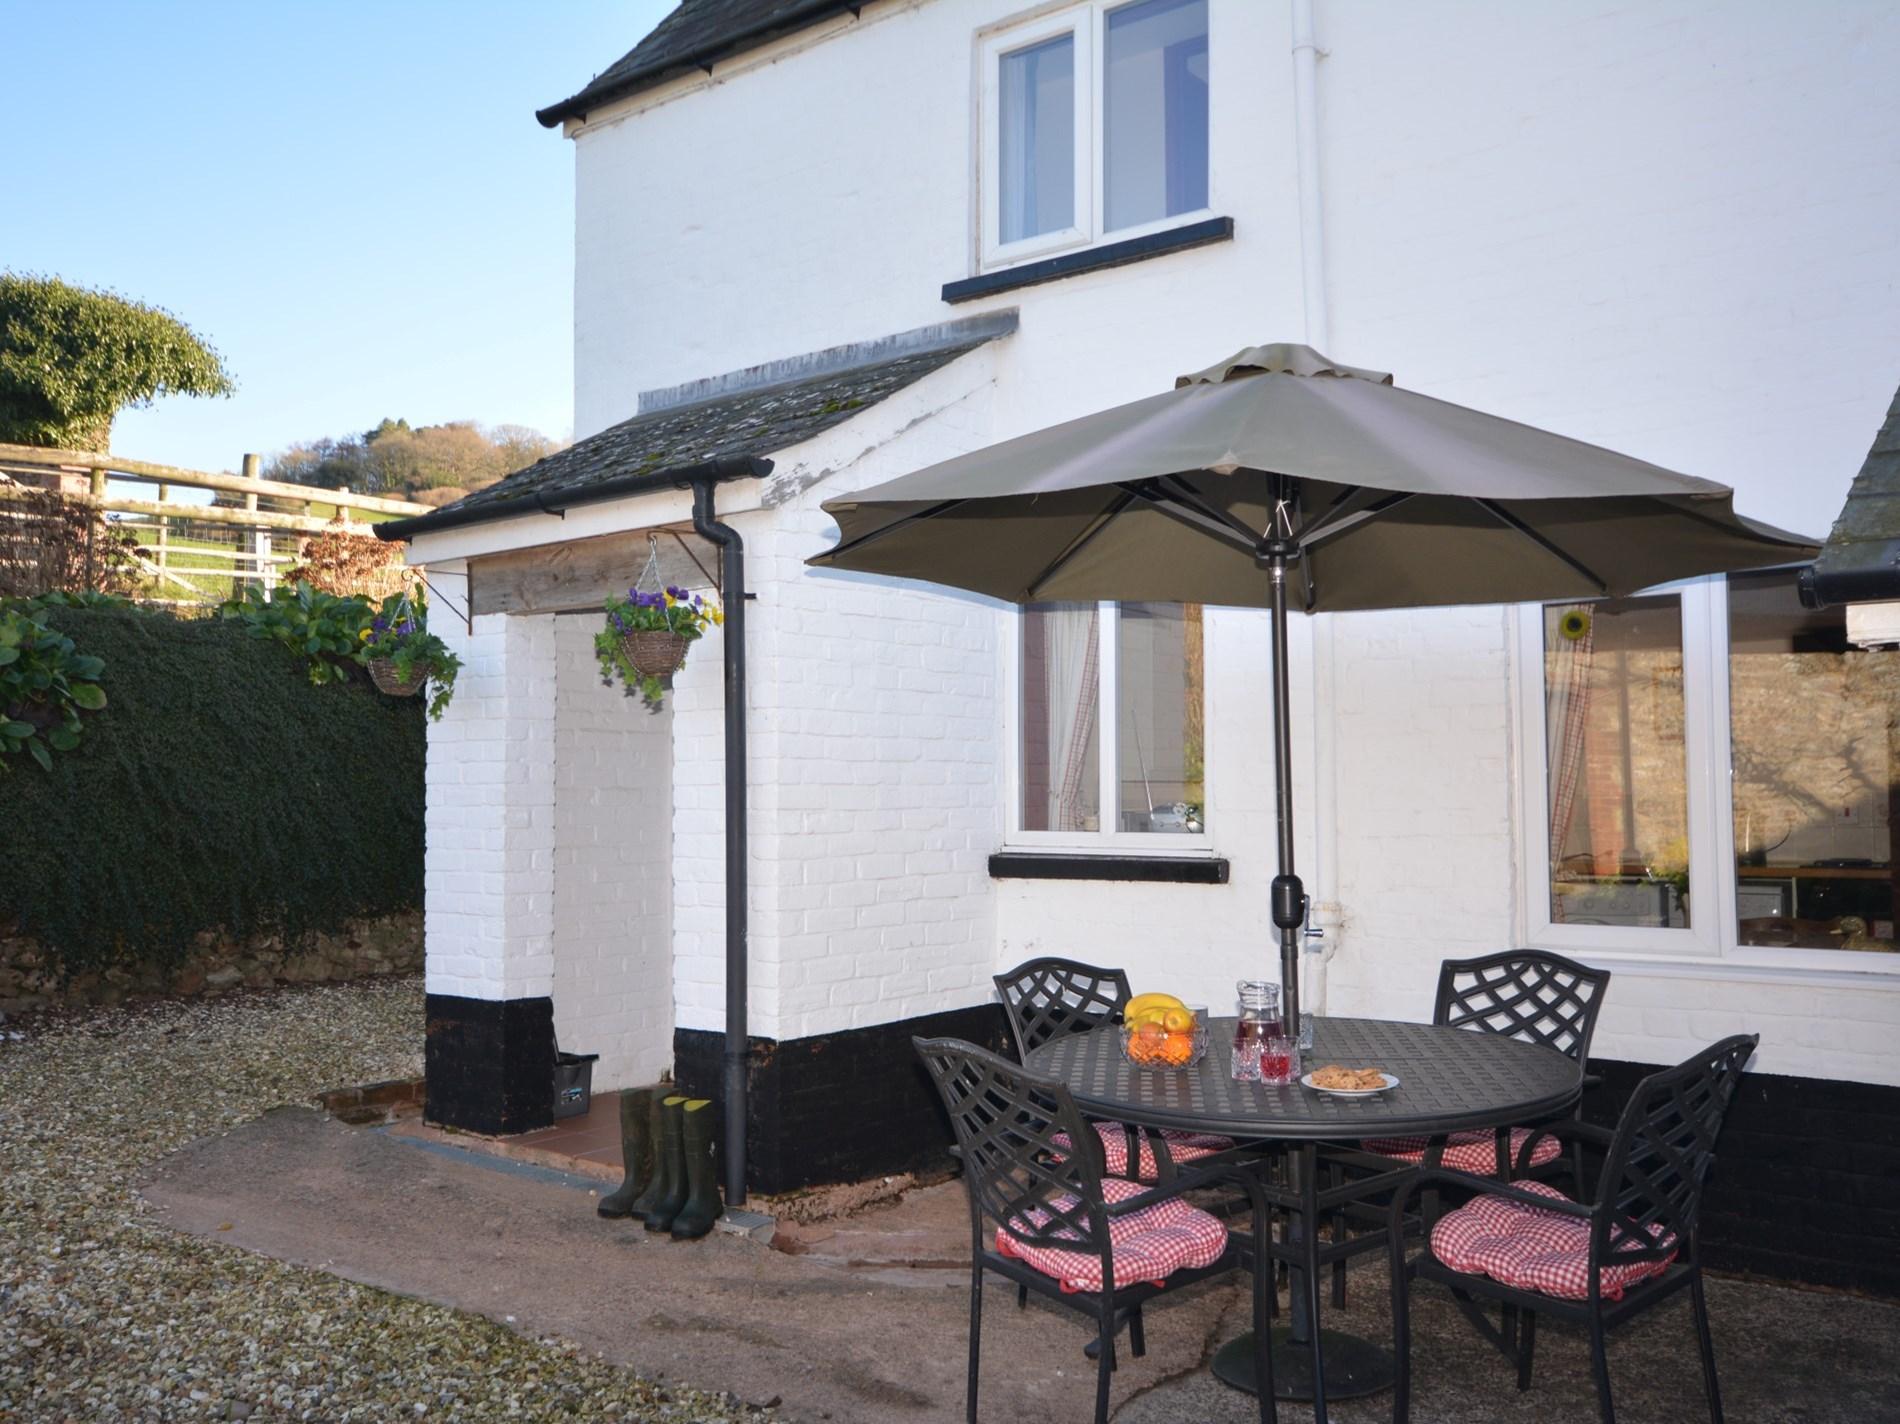 2 Bedroom House in South Devon, Devon